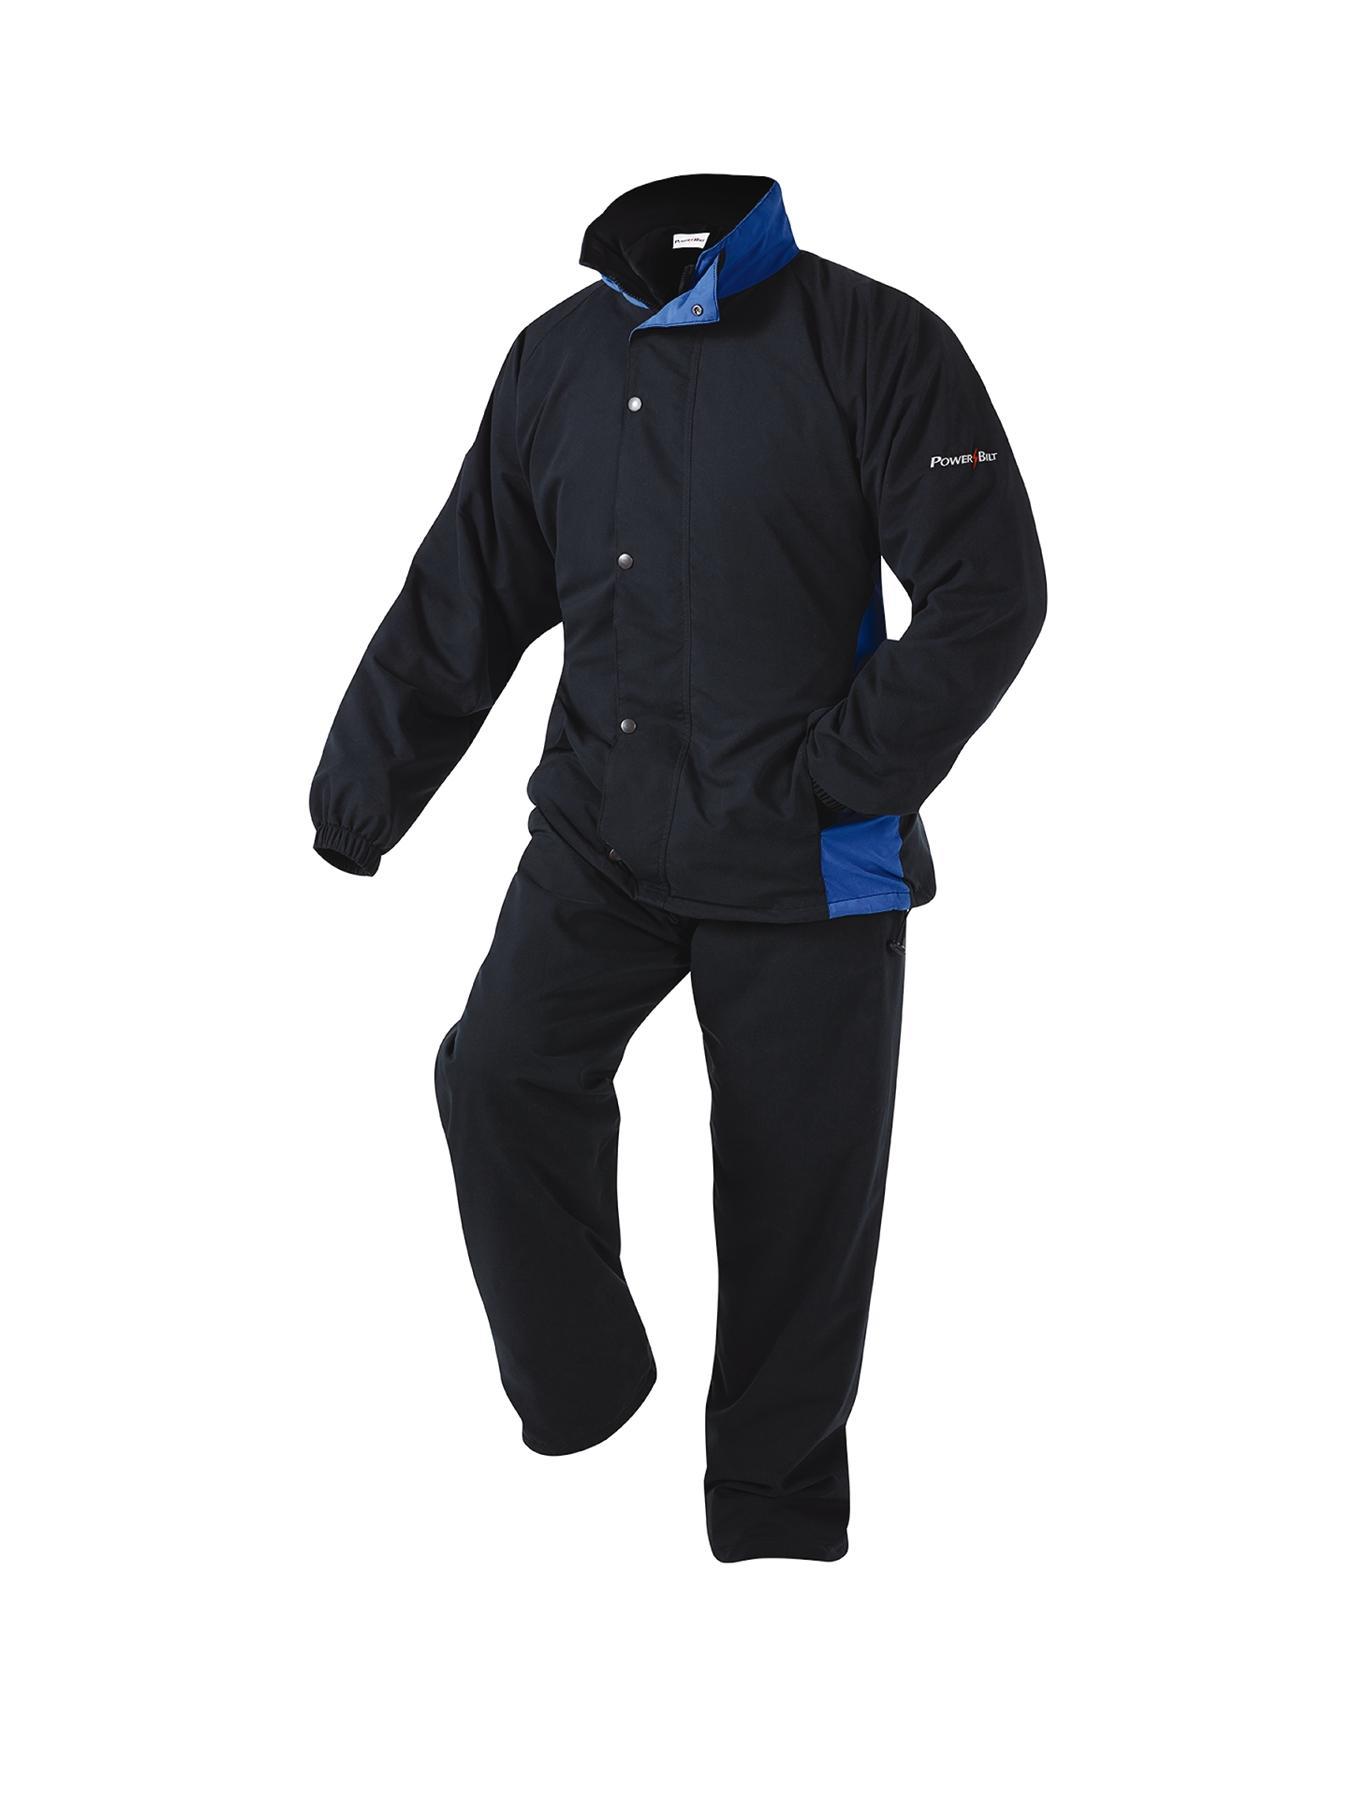 Powerbilt Nimbus Waterproof Mens Golf Suit, Black